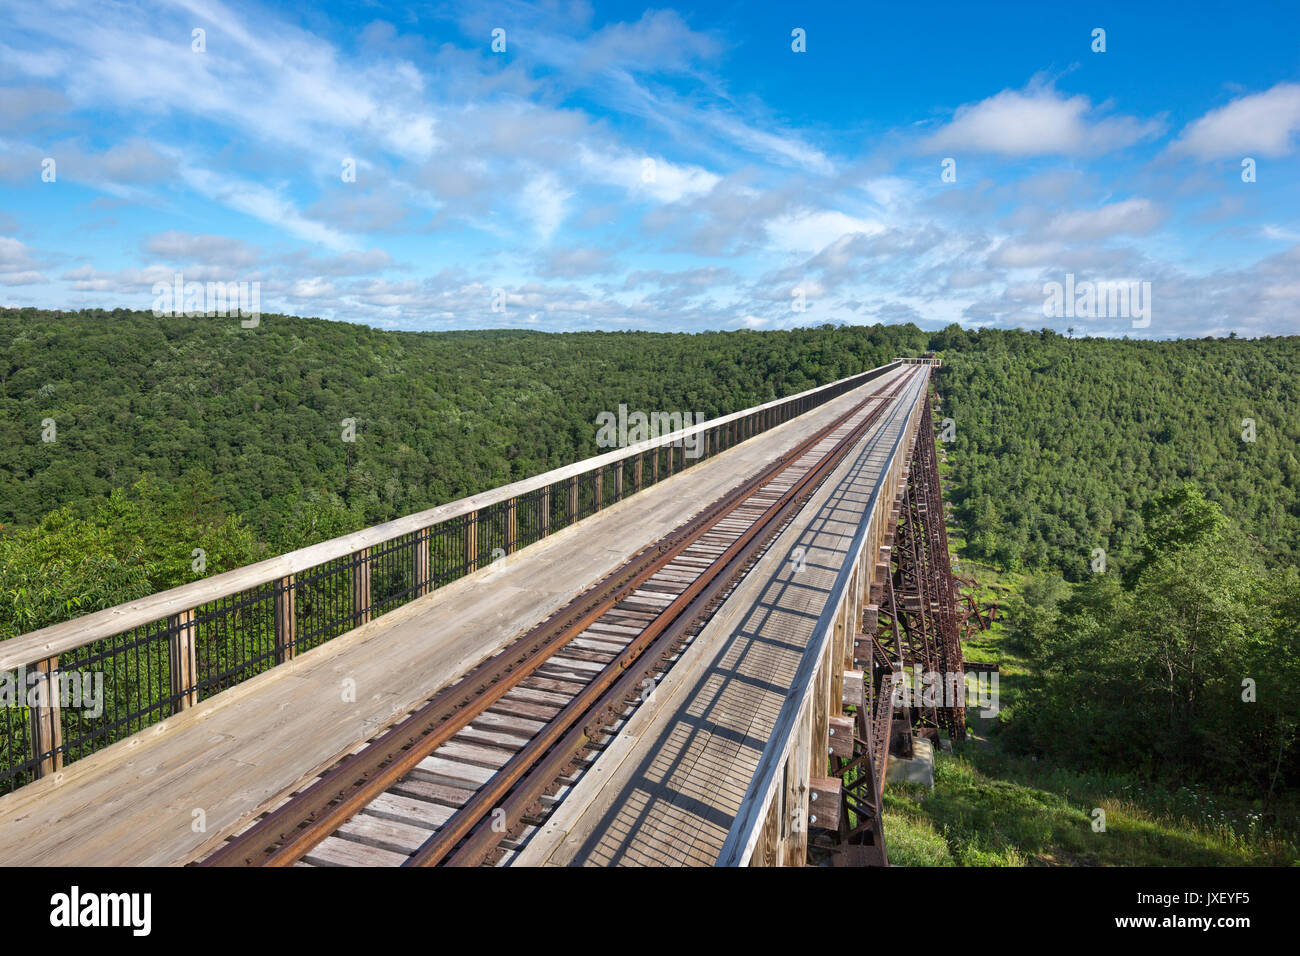 KINZUA VIADUCT SKYWALK MOUNT JEWETT MCKEAN COUNTY PENNSYLVANIA USA - Stock Image